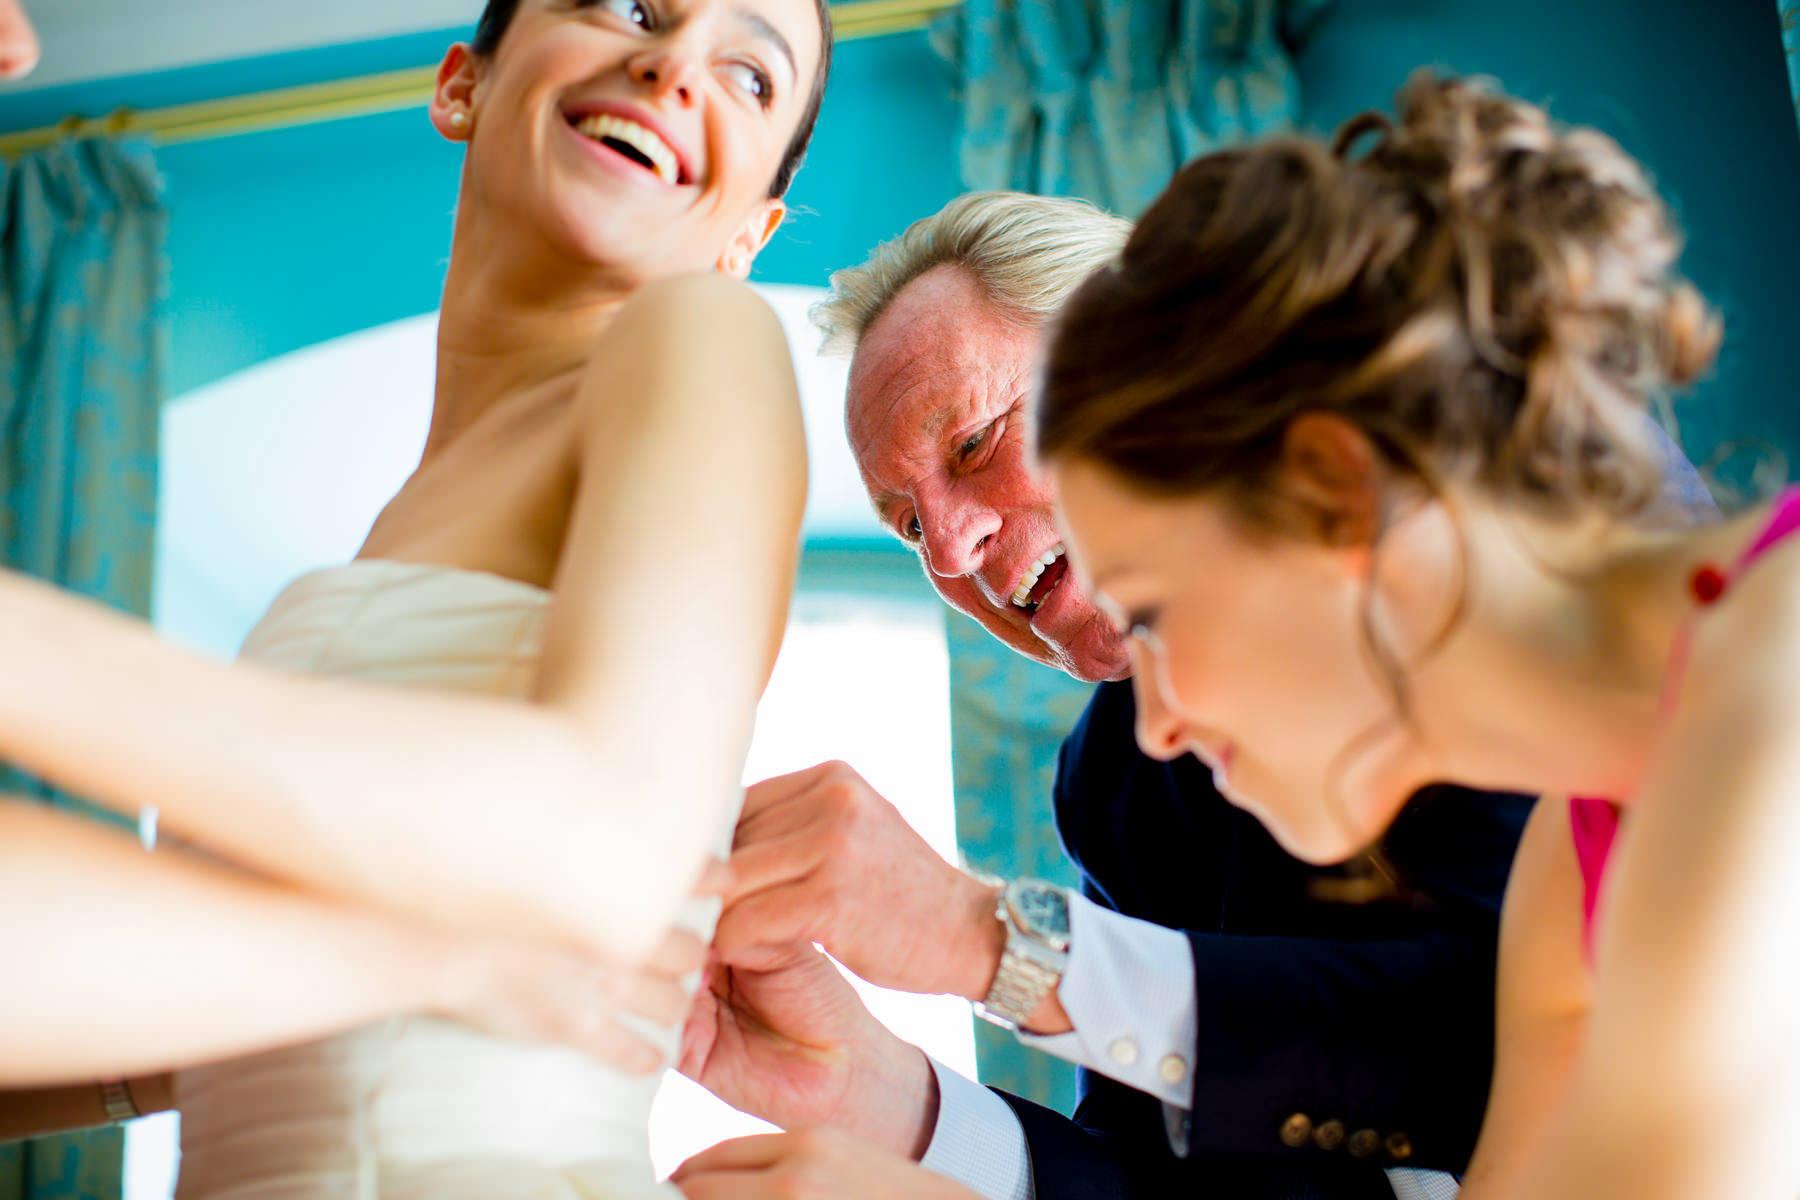 narracia-wygledacz-photographe-mariage-portfolio-27.jpg